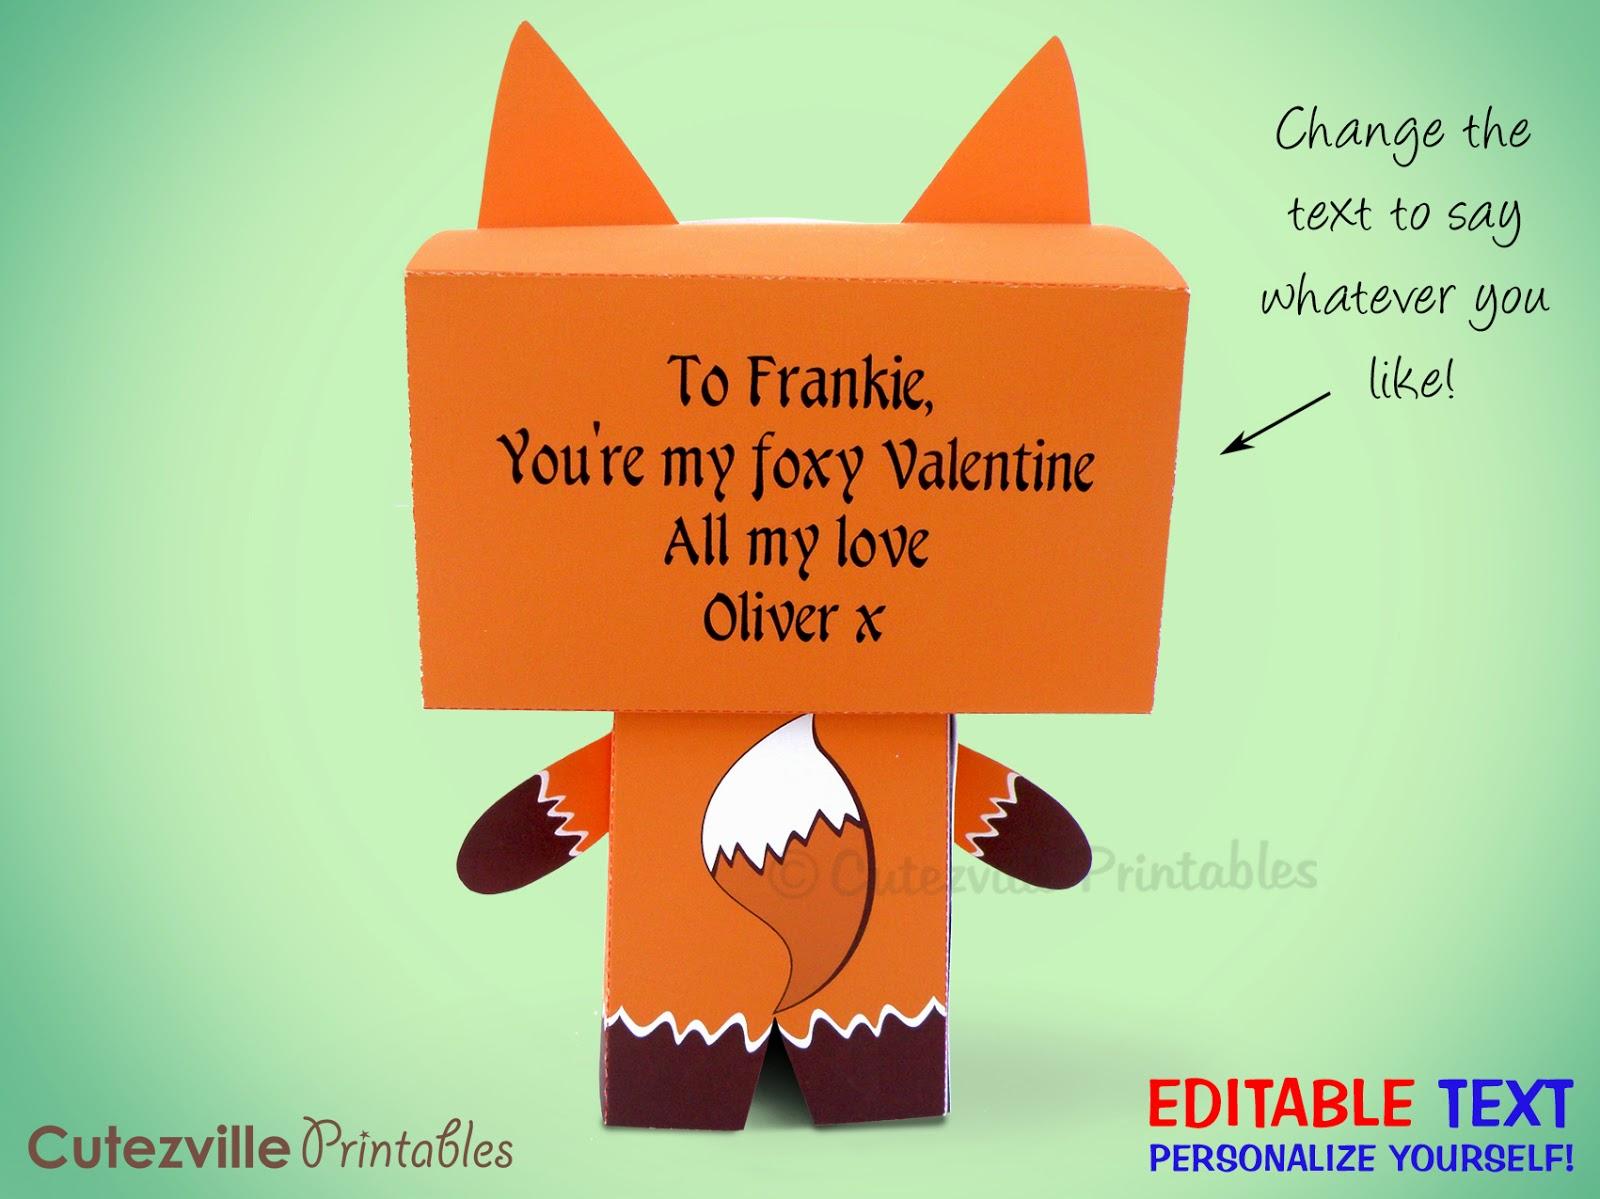 Cutezville Printables Super Cute Fox Box Rh Blogspot Com Purse Favor Template DIY